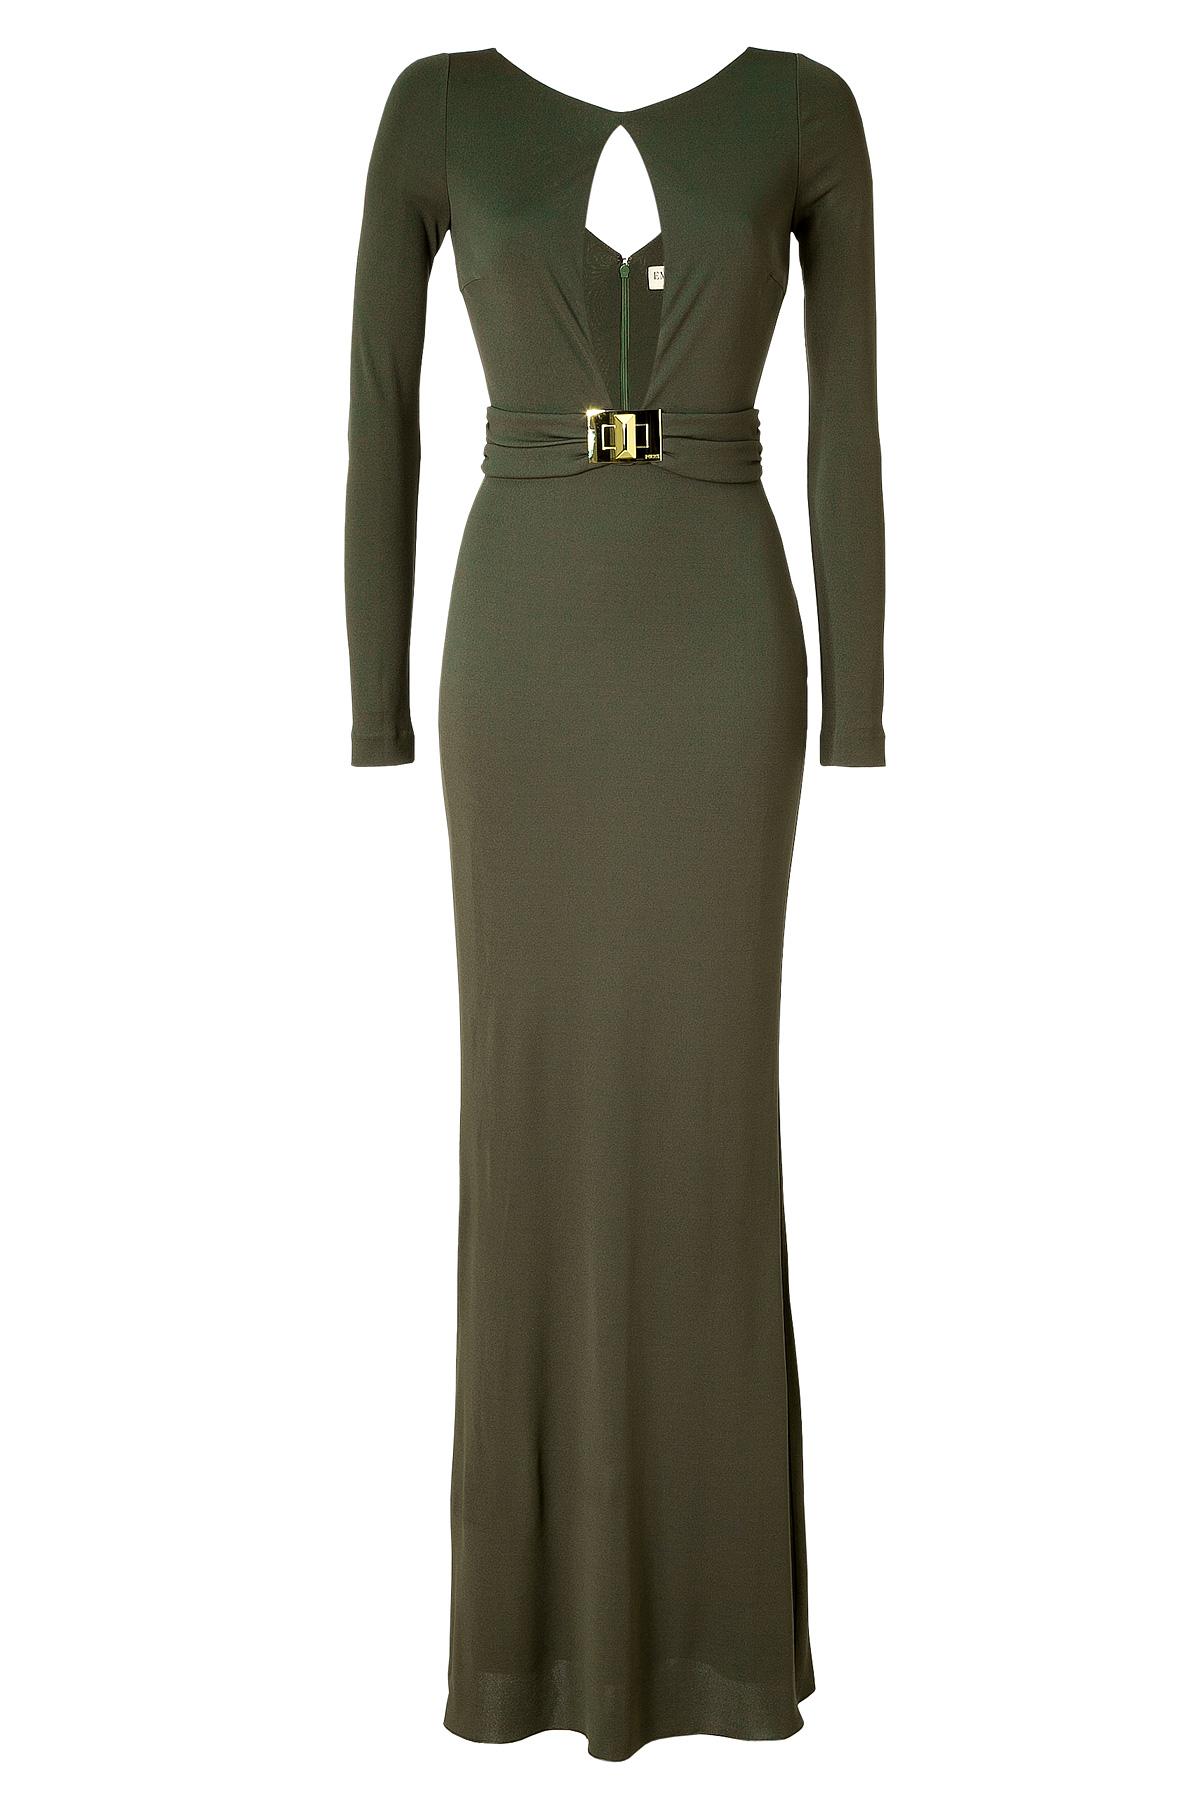 Emilio Pucci Cutout Illusion Dress Sale View Fullscreen Emilio Pucci